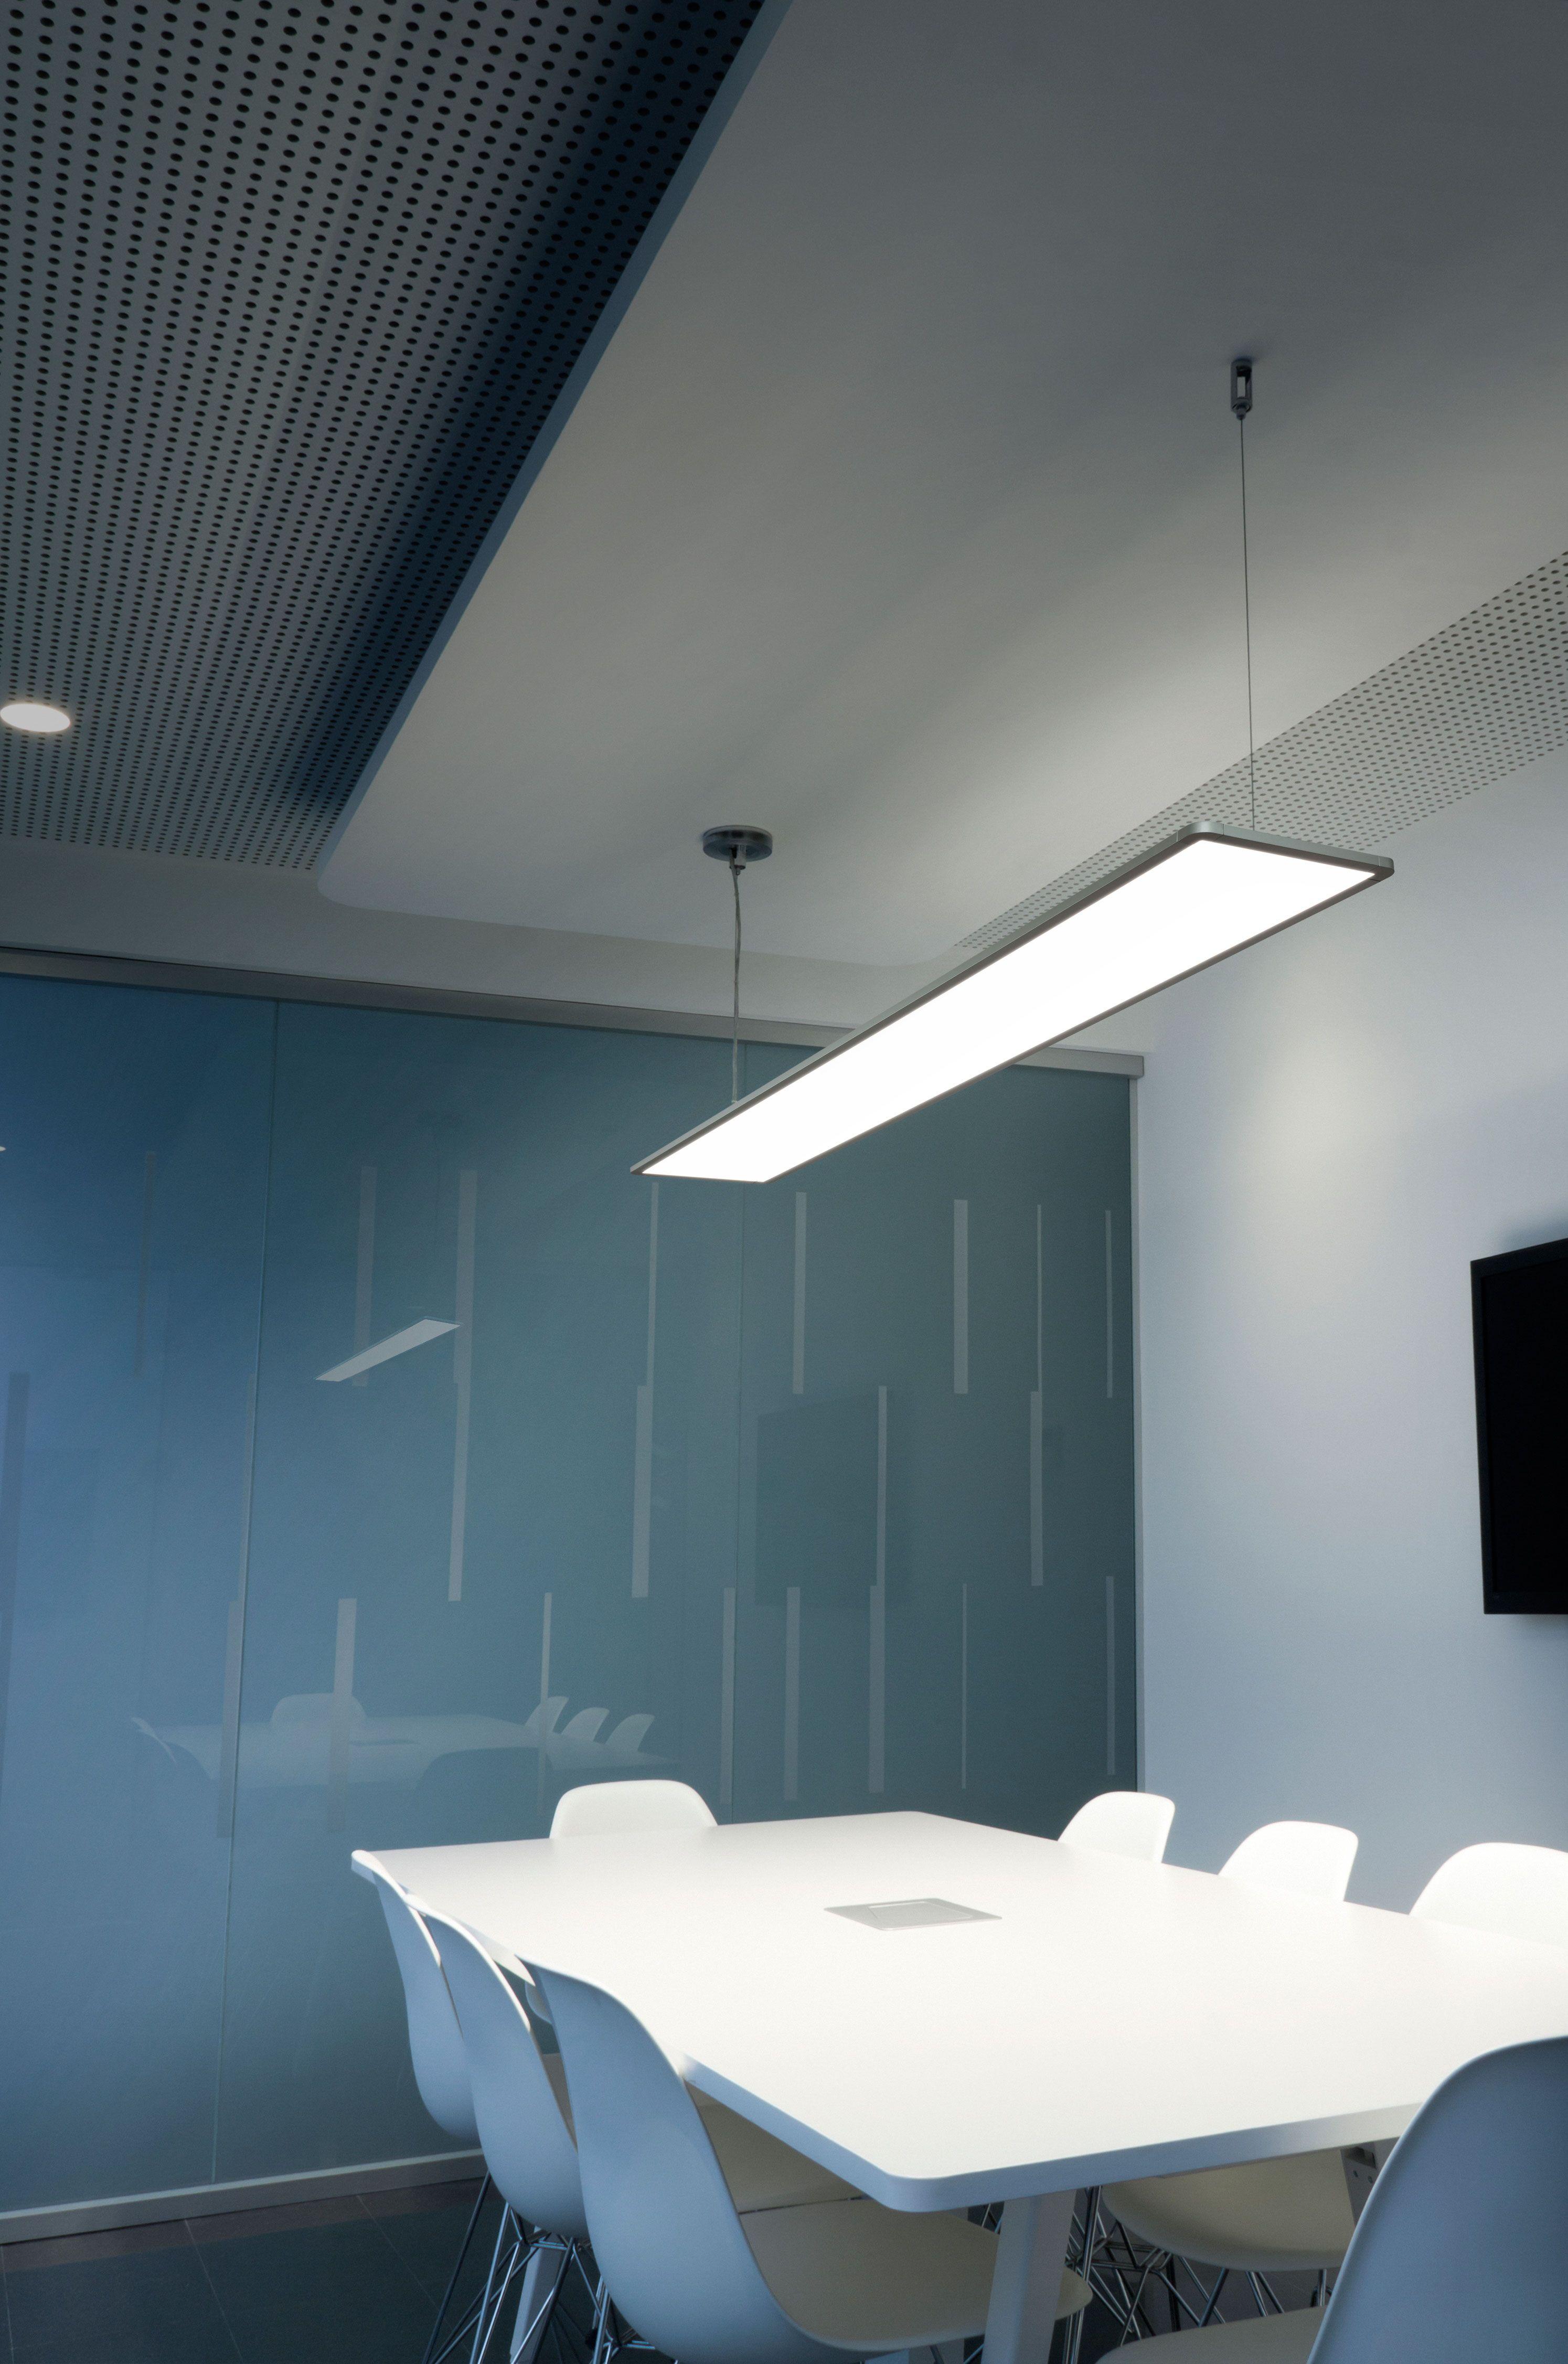 Super Flat Designed By Flos Architectural Office Lighting Ceiling Garage Design Interior Office Lighting